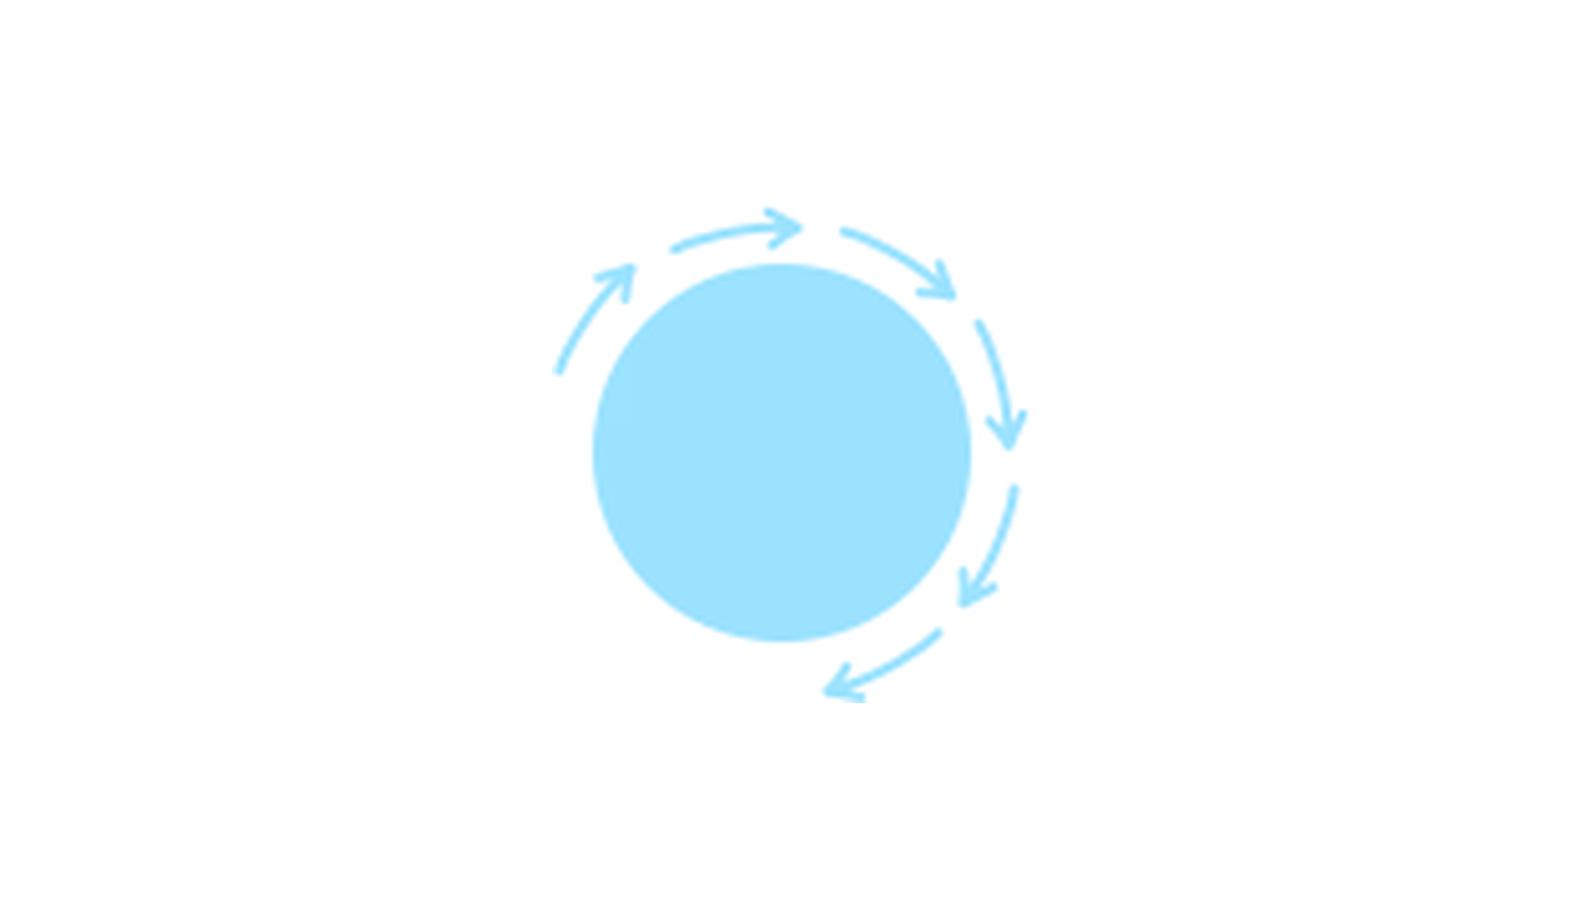 rotating a circle does nothing